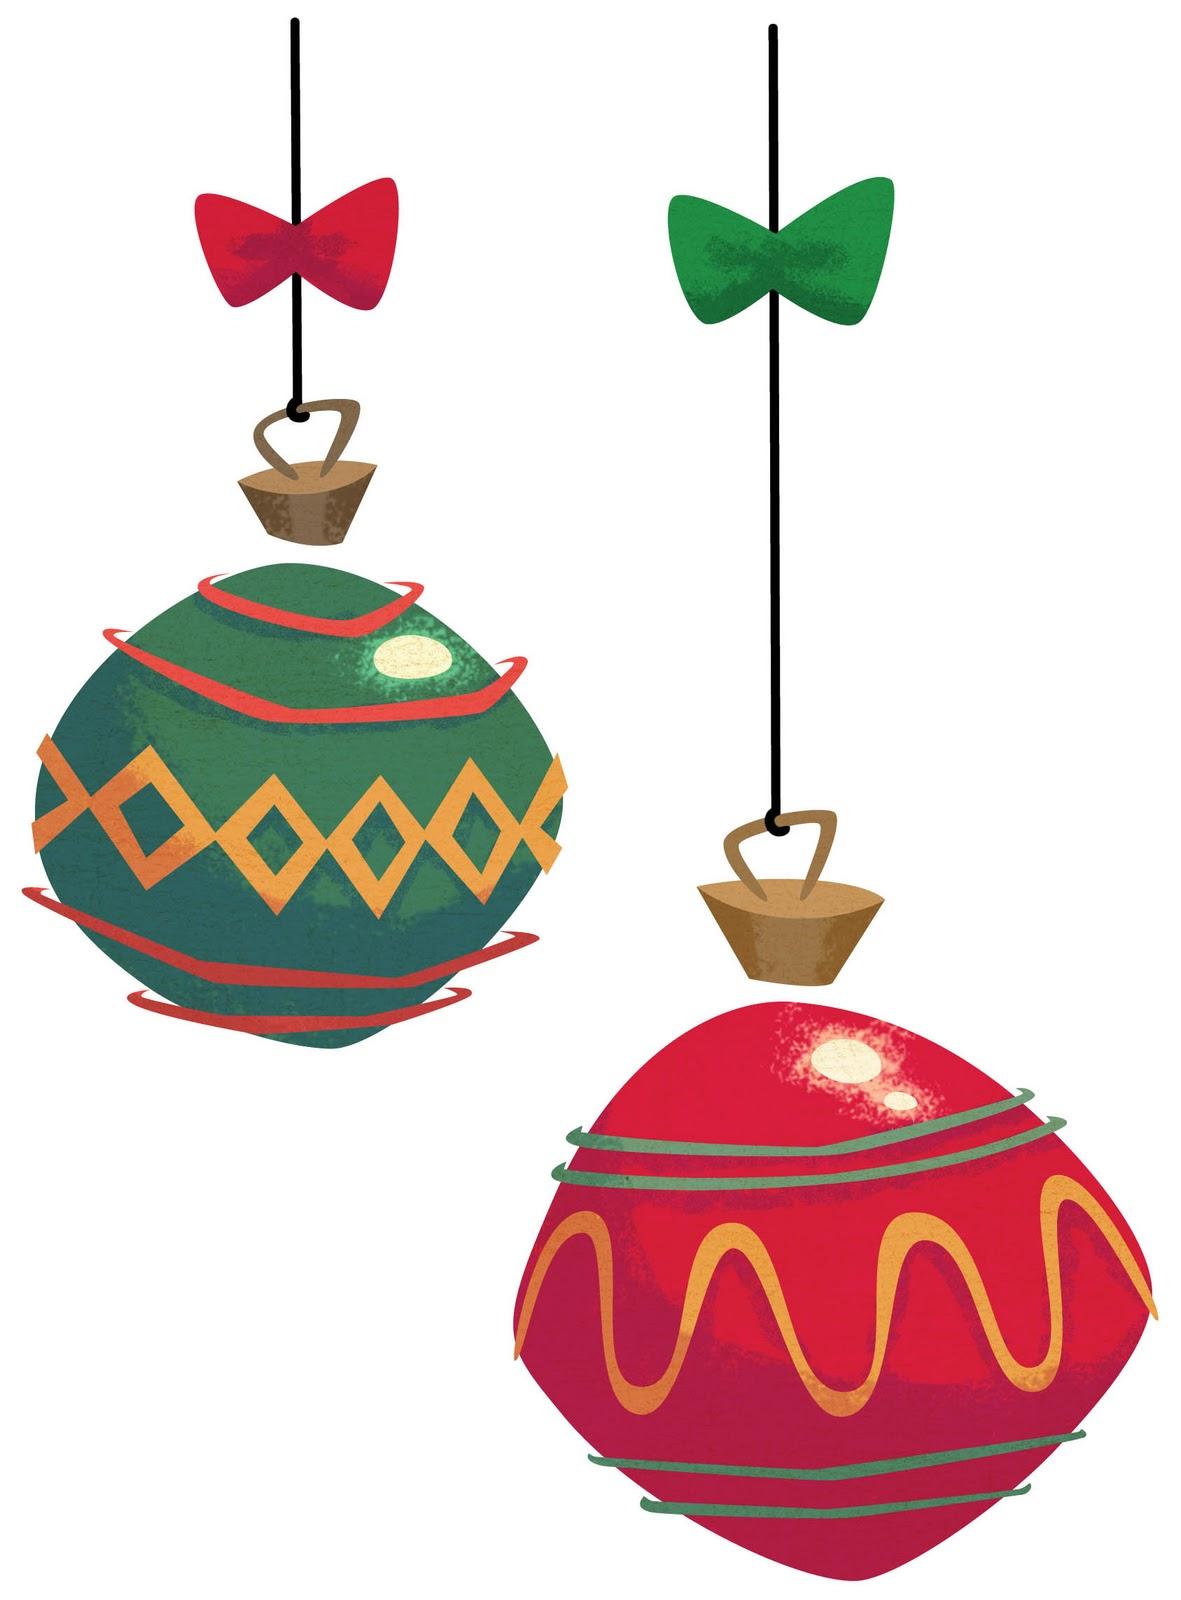 Christmas Border Clip Art | Clipart libr-Christmas Border Clip Art | Clipart library - Free Clipart Images-7